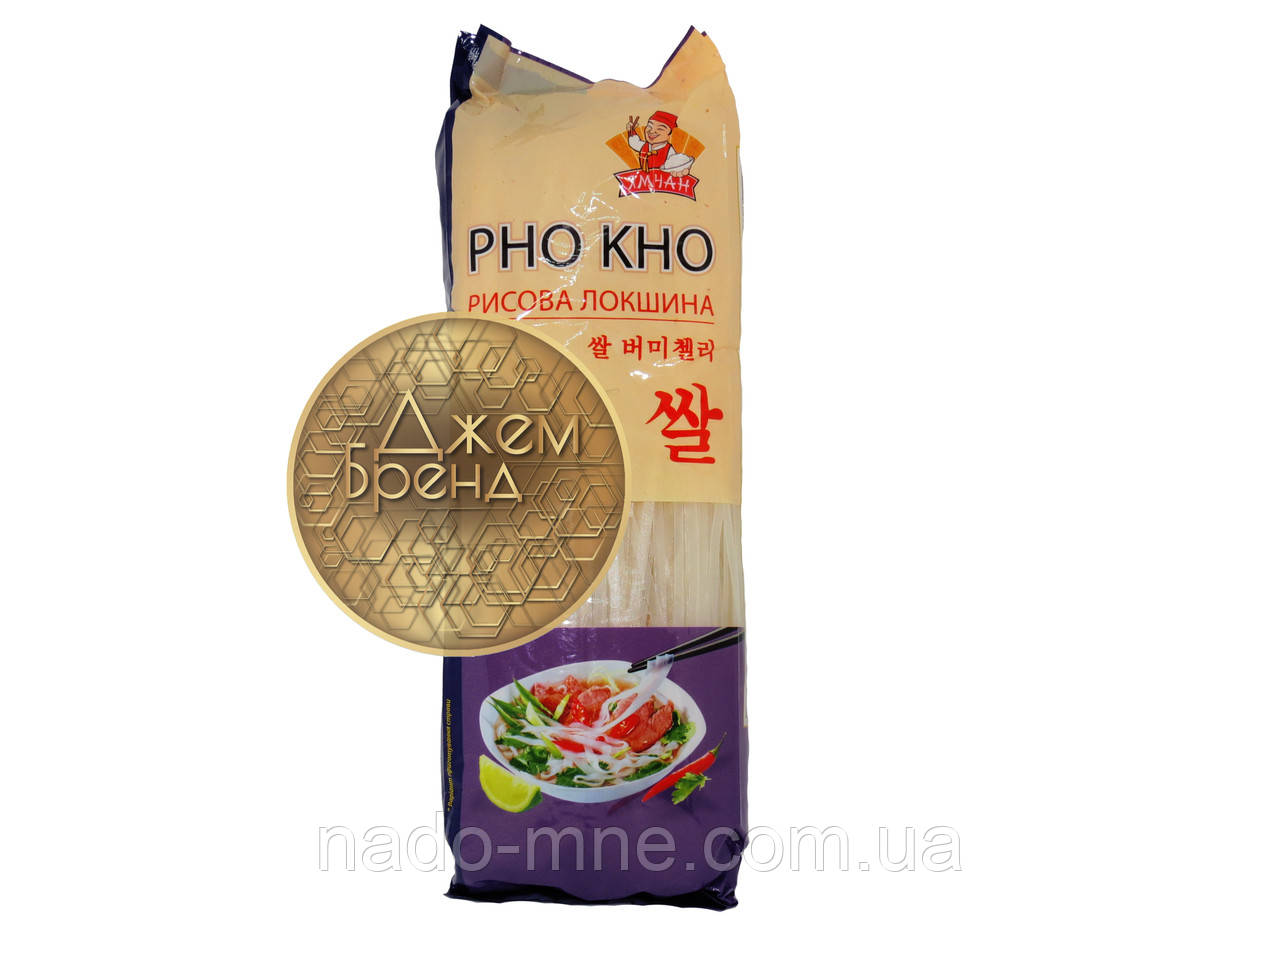 Лапша рисовая RHO KHO 300 гр.